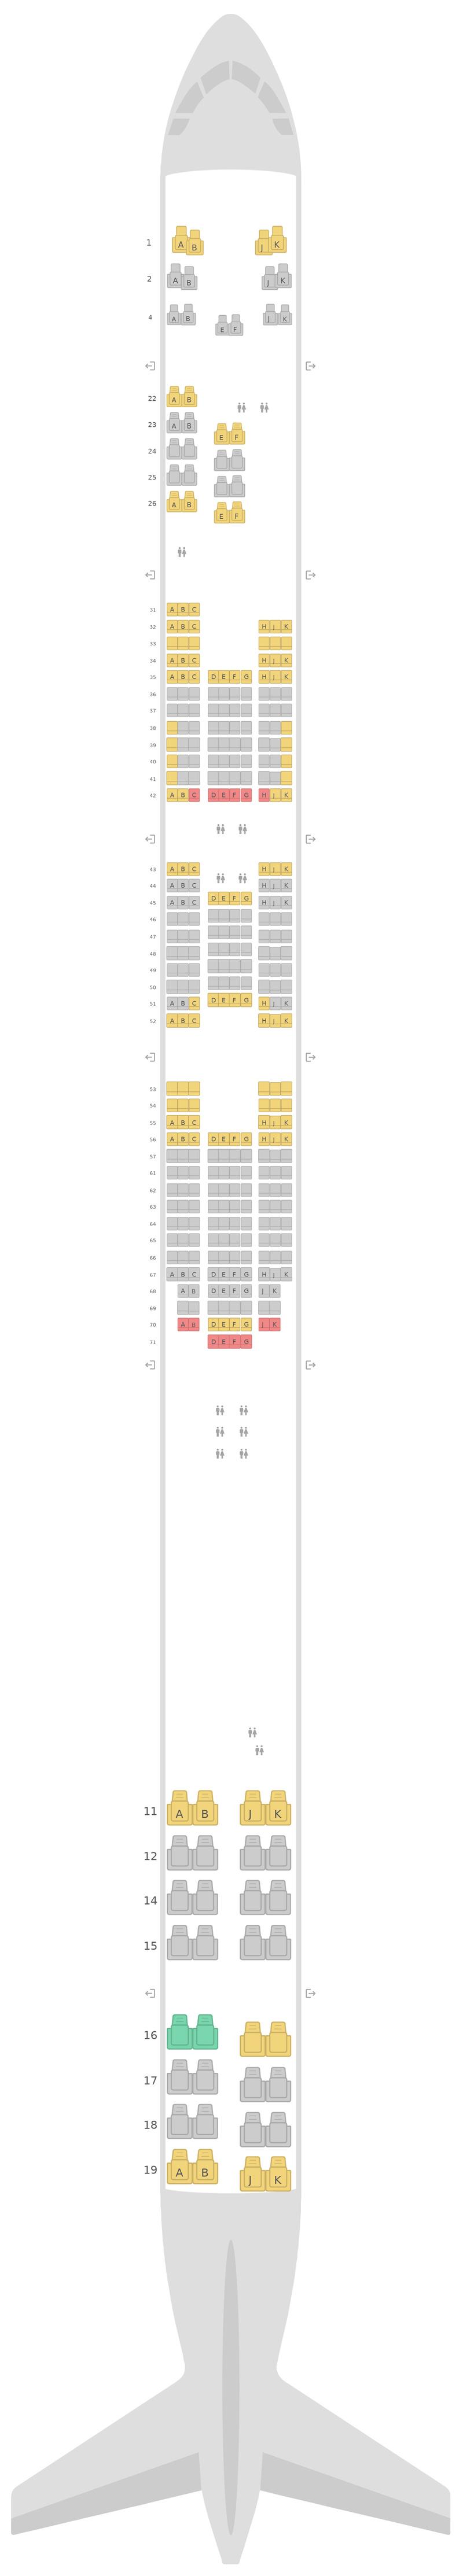 Mapa de asientos Boeing 747-400 (744) v1 Thai Airways